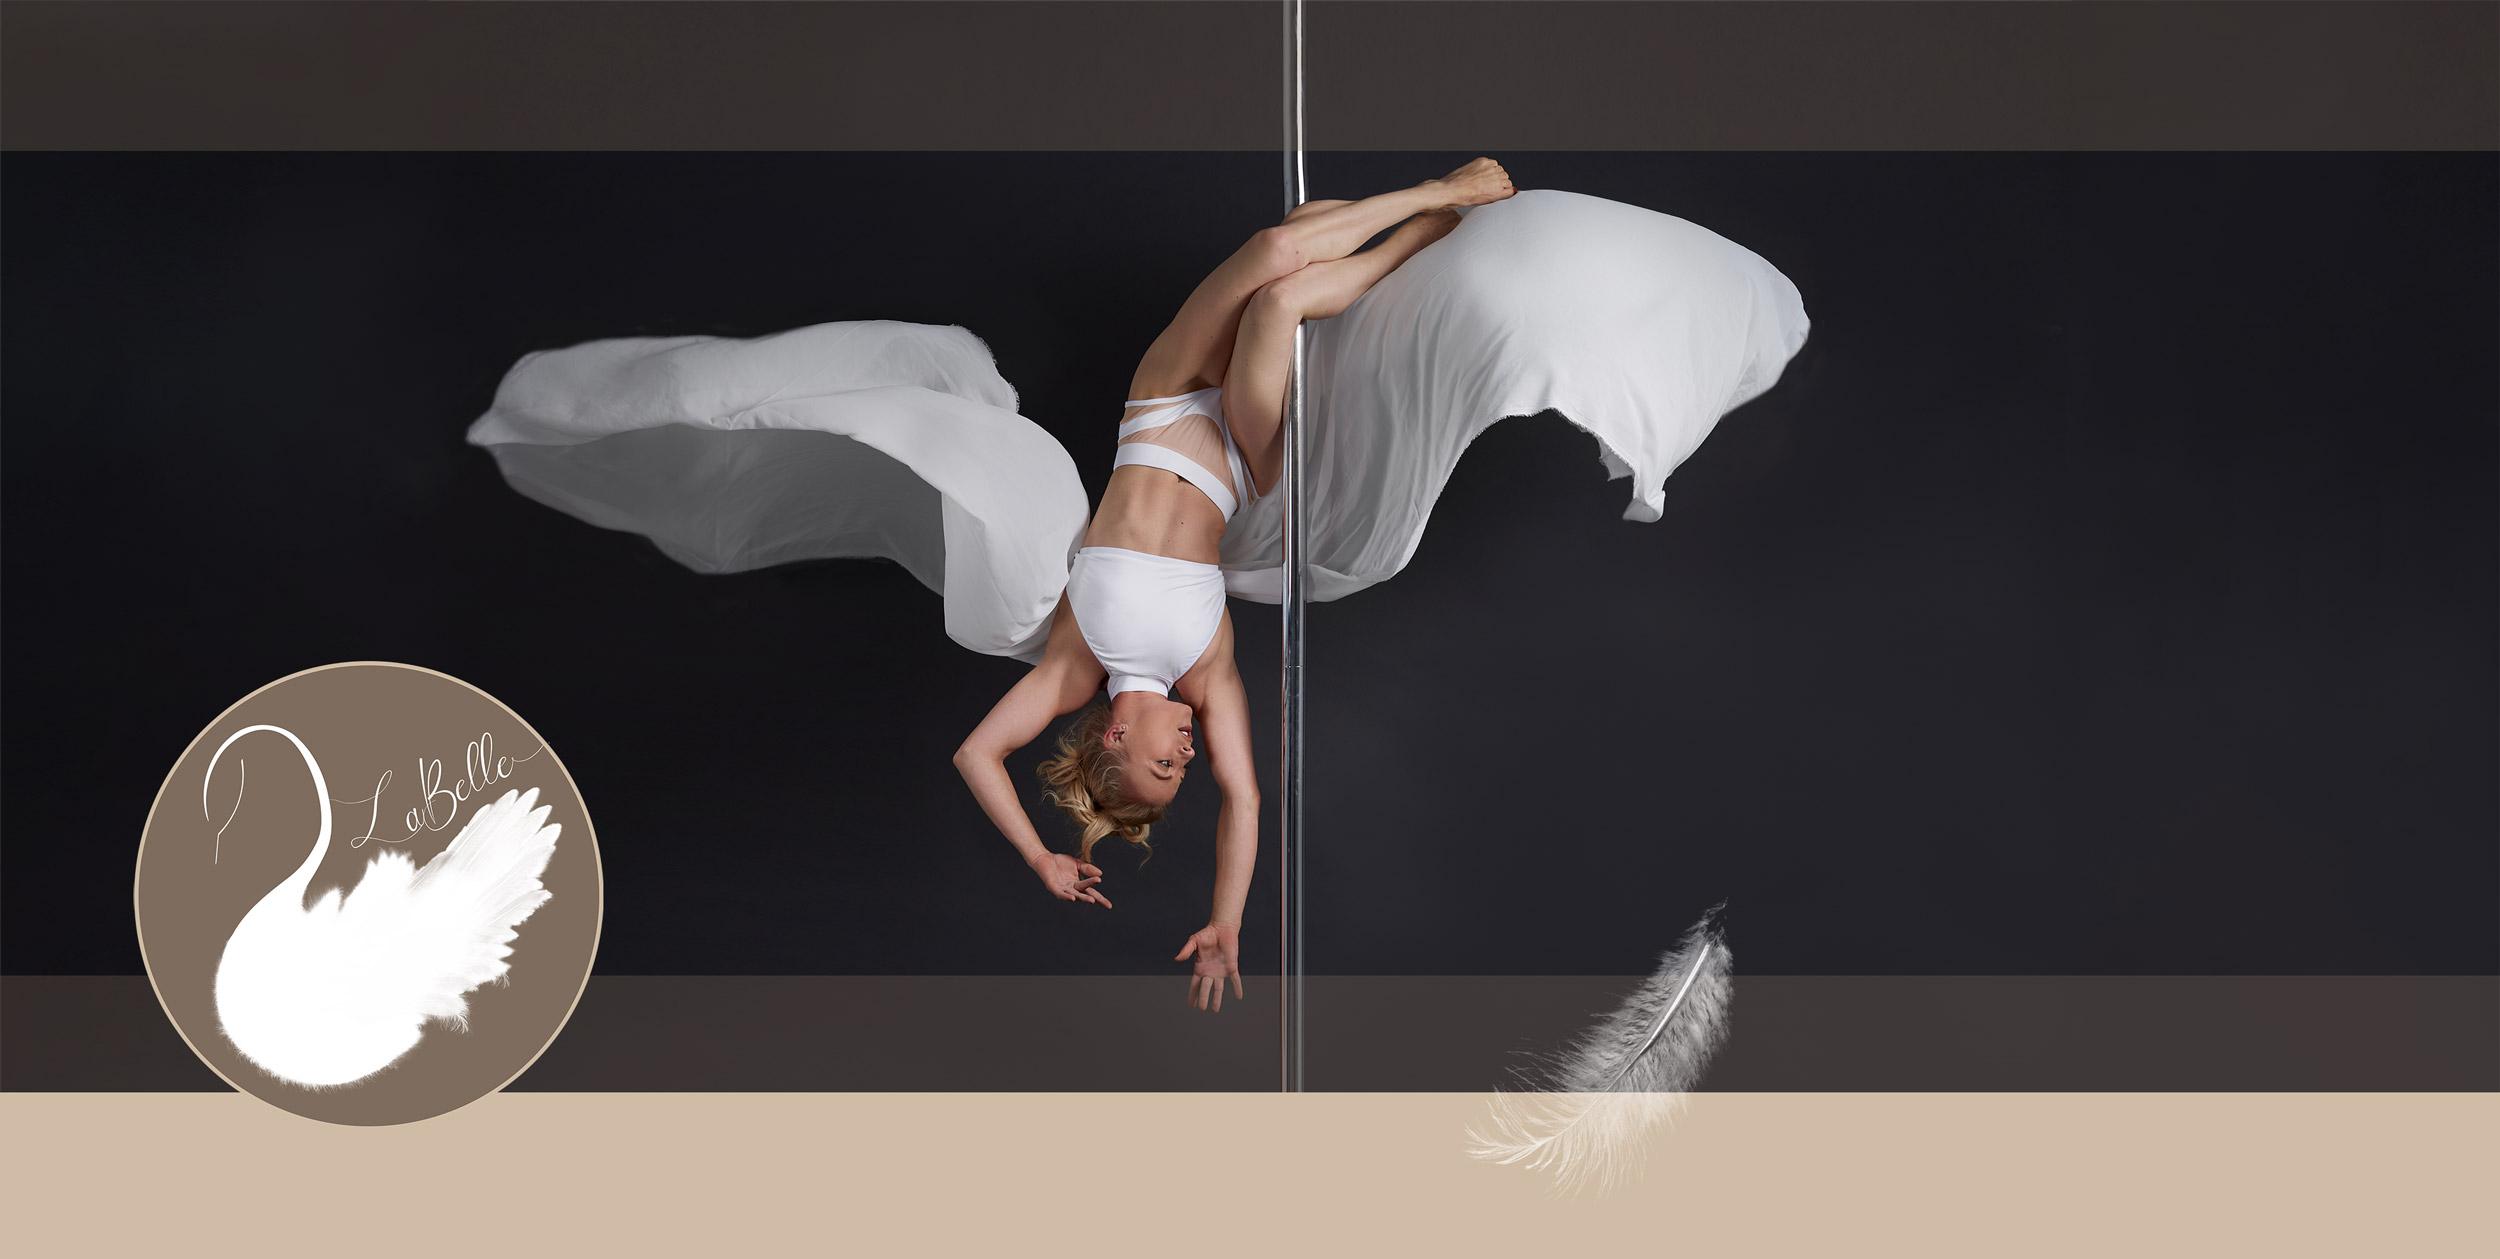 Pole Dance Studio LaBelle in Hannover